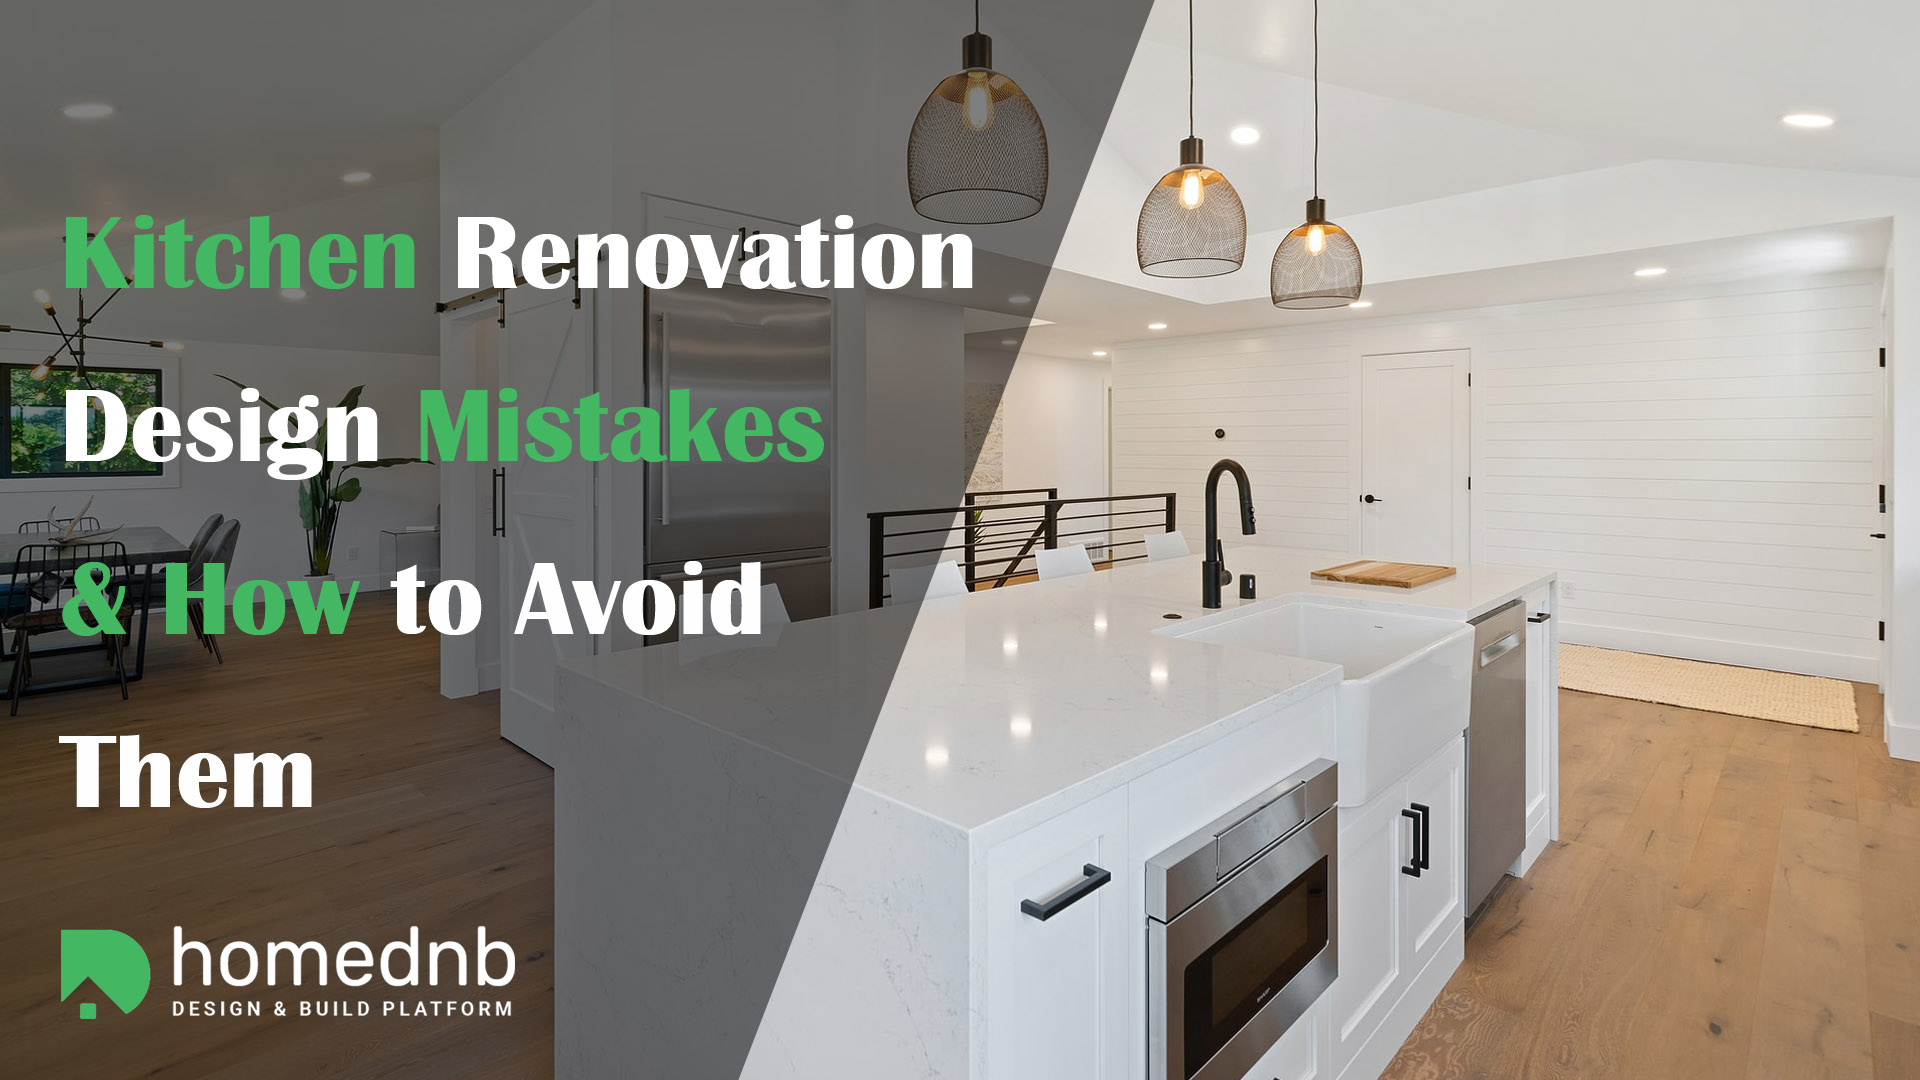 Kitchen Renovation Design Mistakes & How to Avoid Them